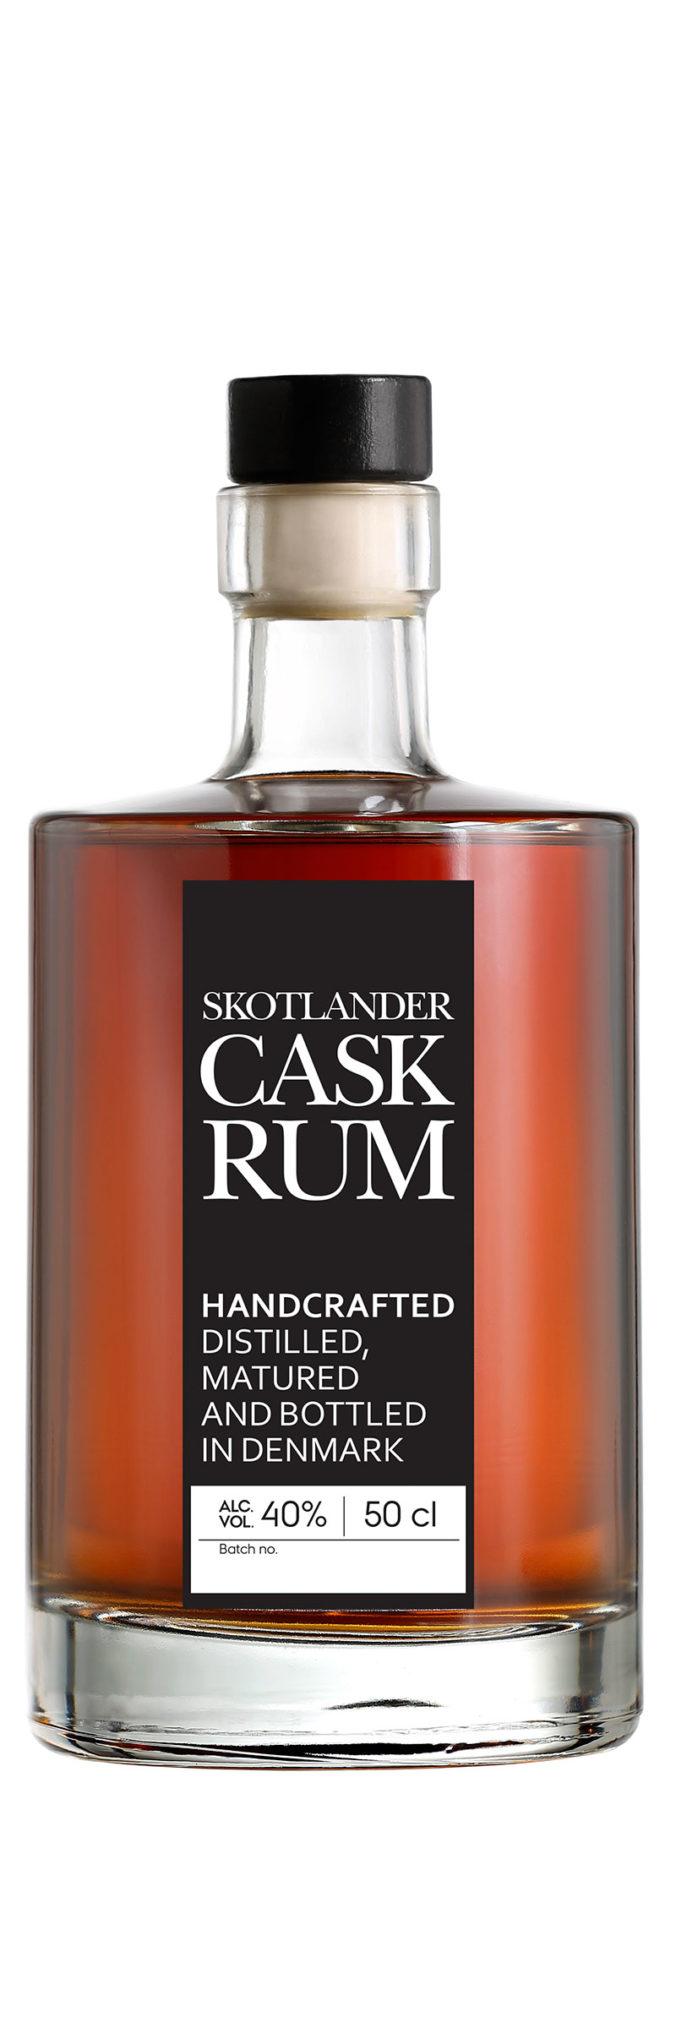 Skotlander Cask aged rum from Denmark